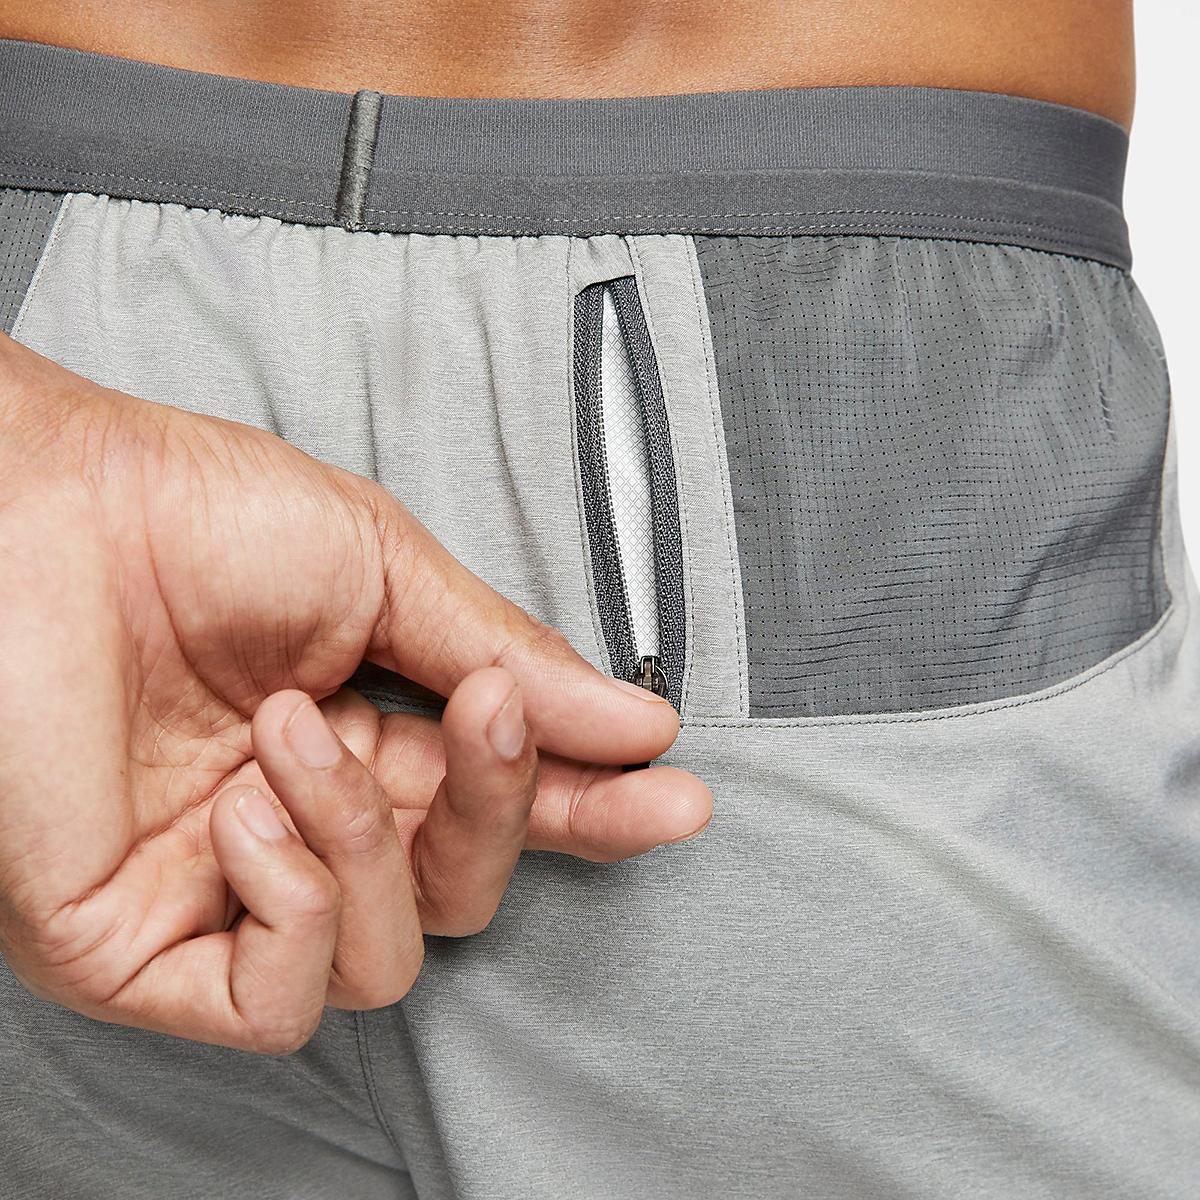 "Men's Nike Men's Flex Stride 5"" 2-in-1 Short - Color: Iron Grey/ Heather/Reflective Silver - Size: S, Iron Grey/ Heather/Reflective Silver, large, image 6"